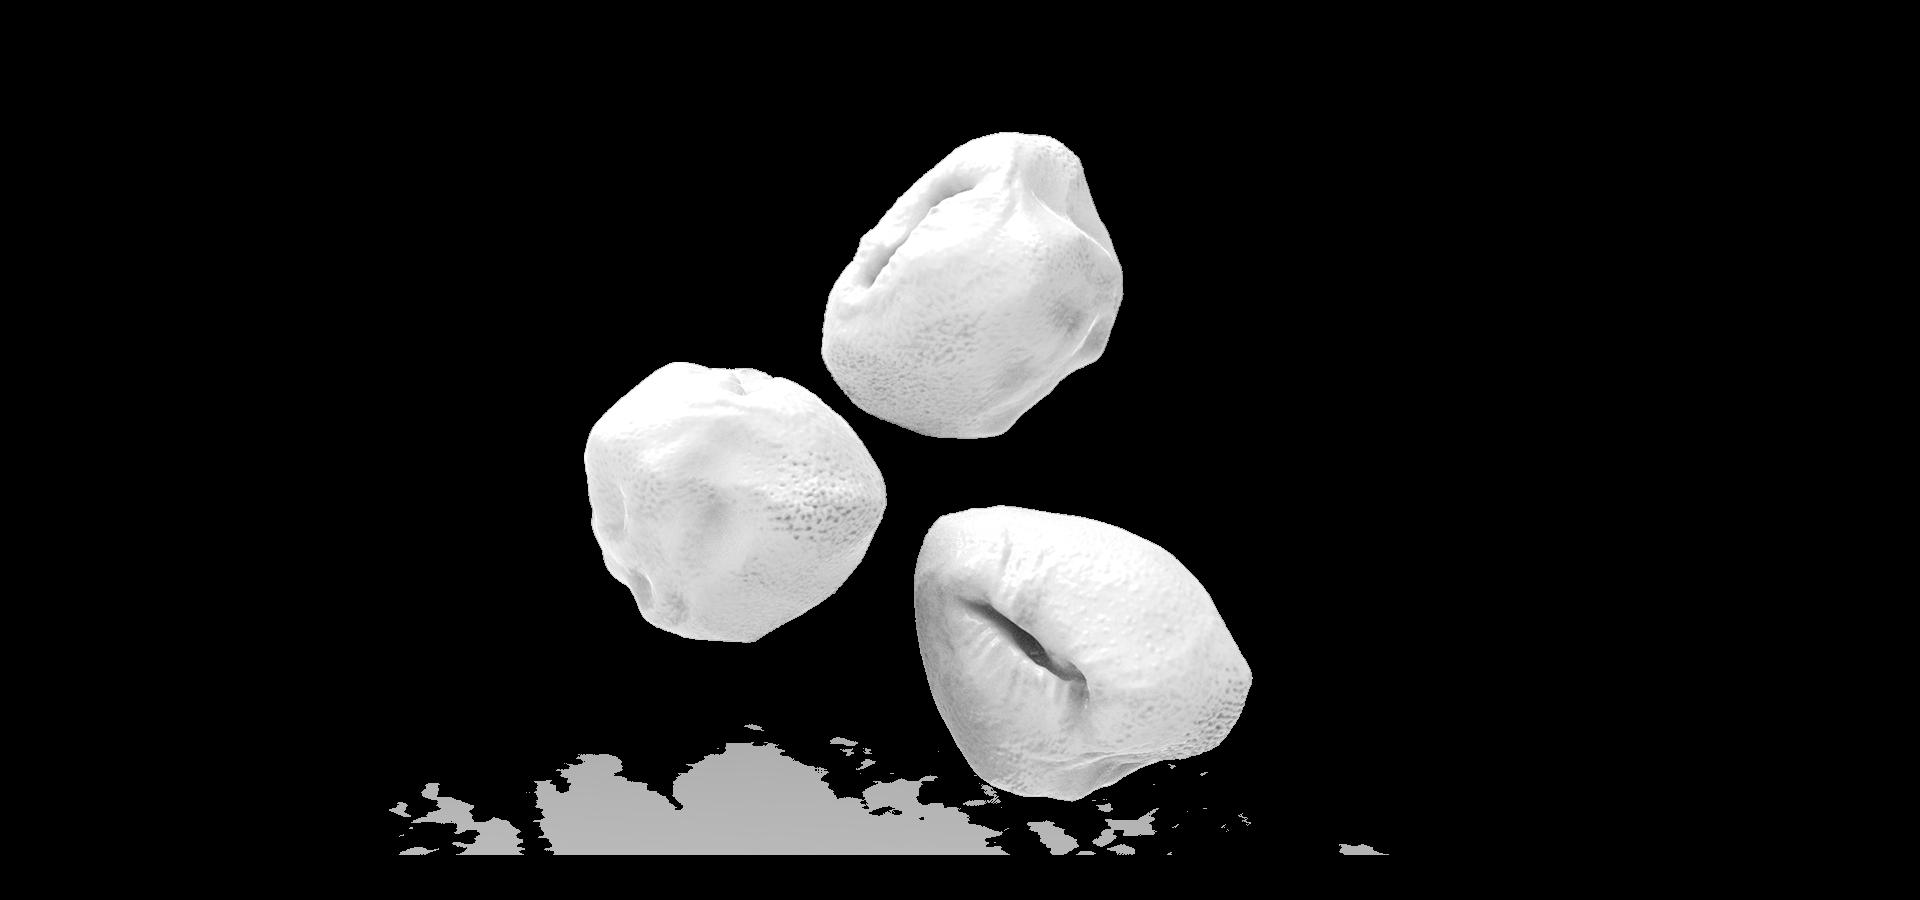 Saccharolobus Solfataricus